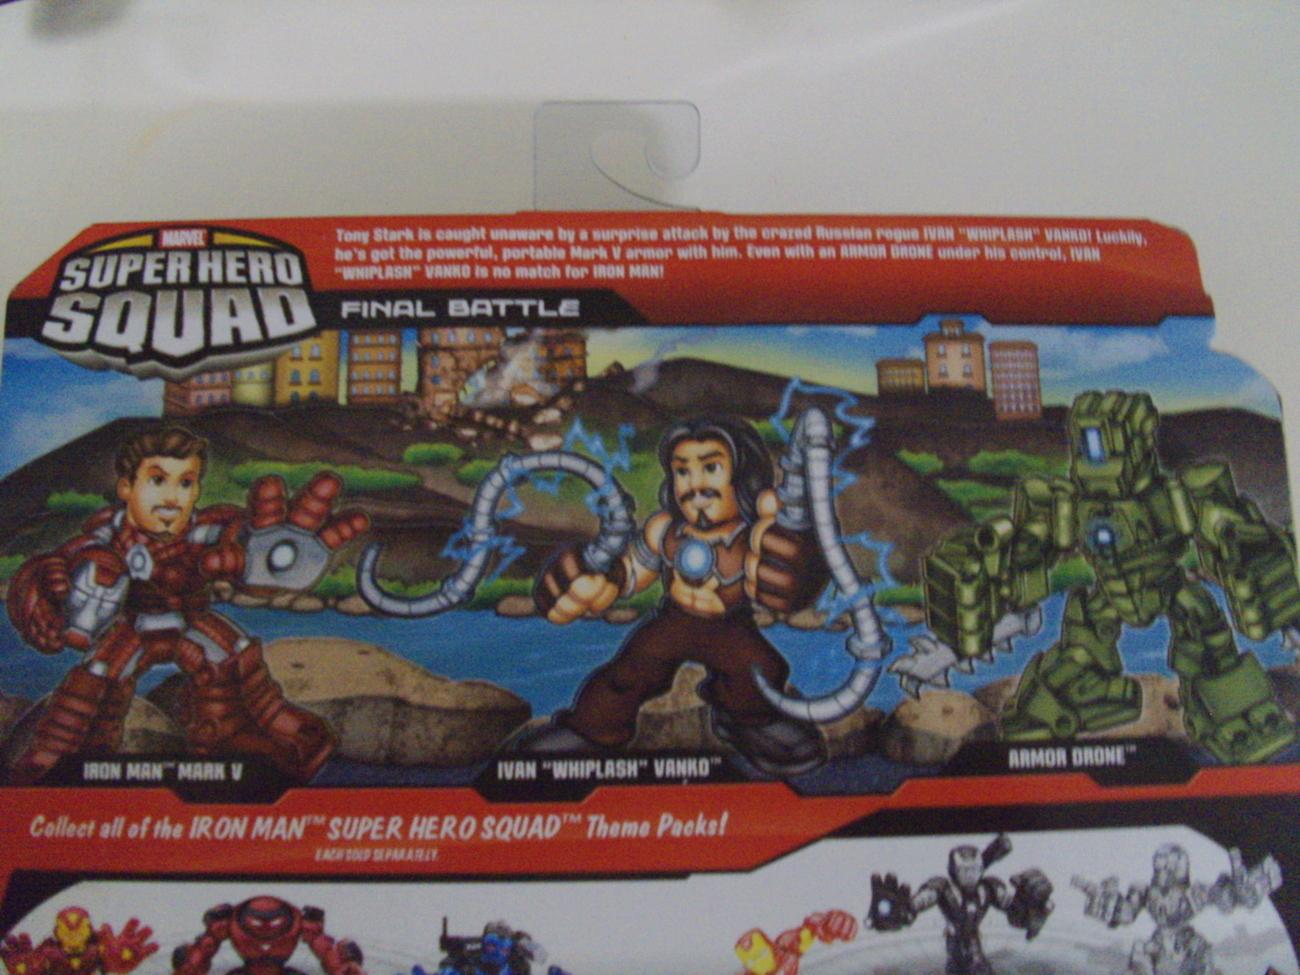 Marvel Comics Iron Man 2 Super Hero Squad Final Battle action figures - New